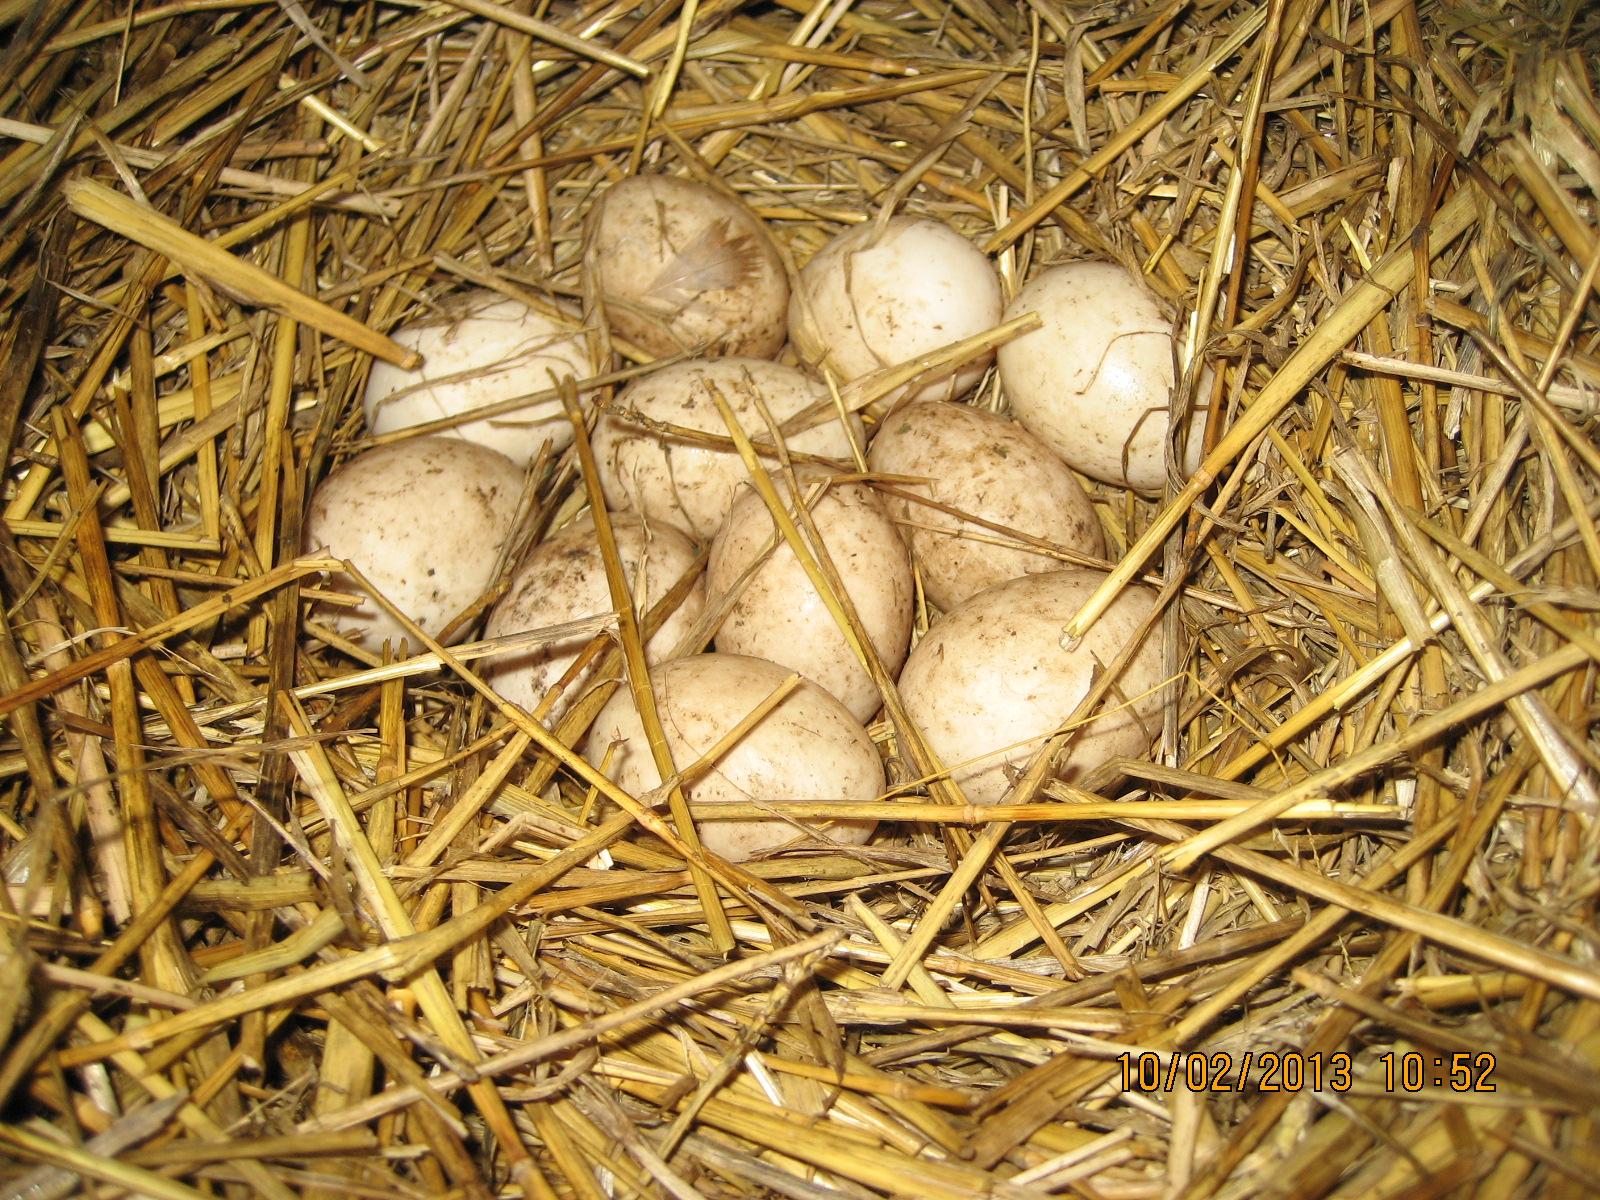 Сайт с топтание яйцъ 2 фотография